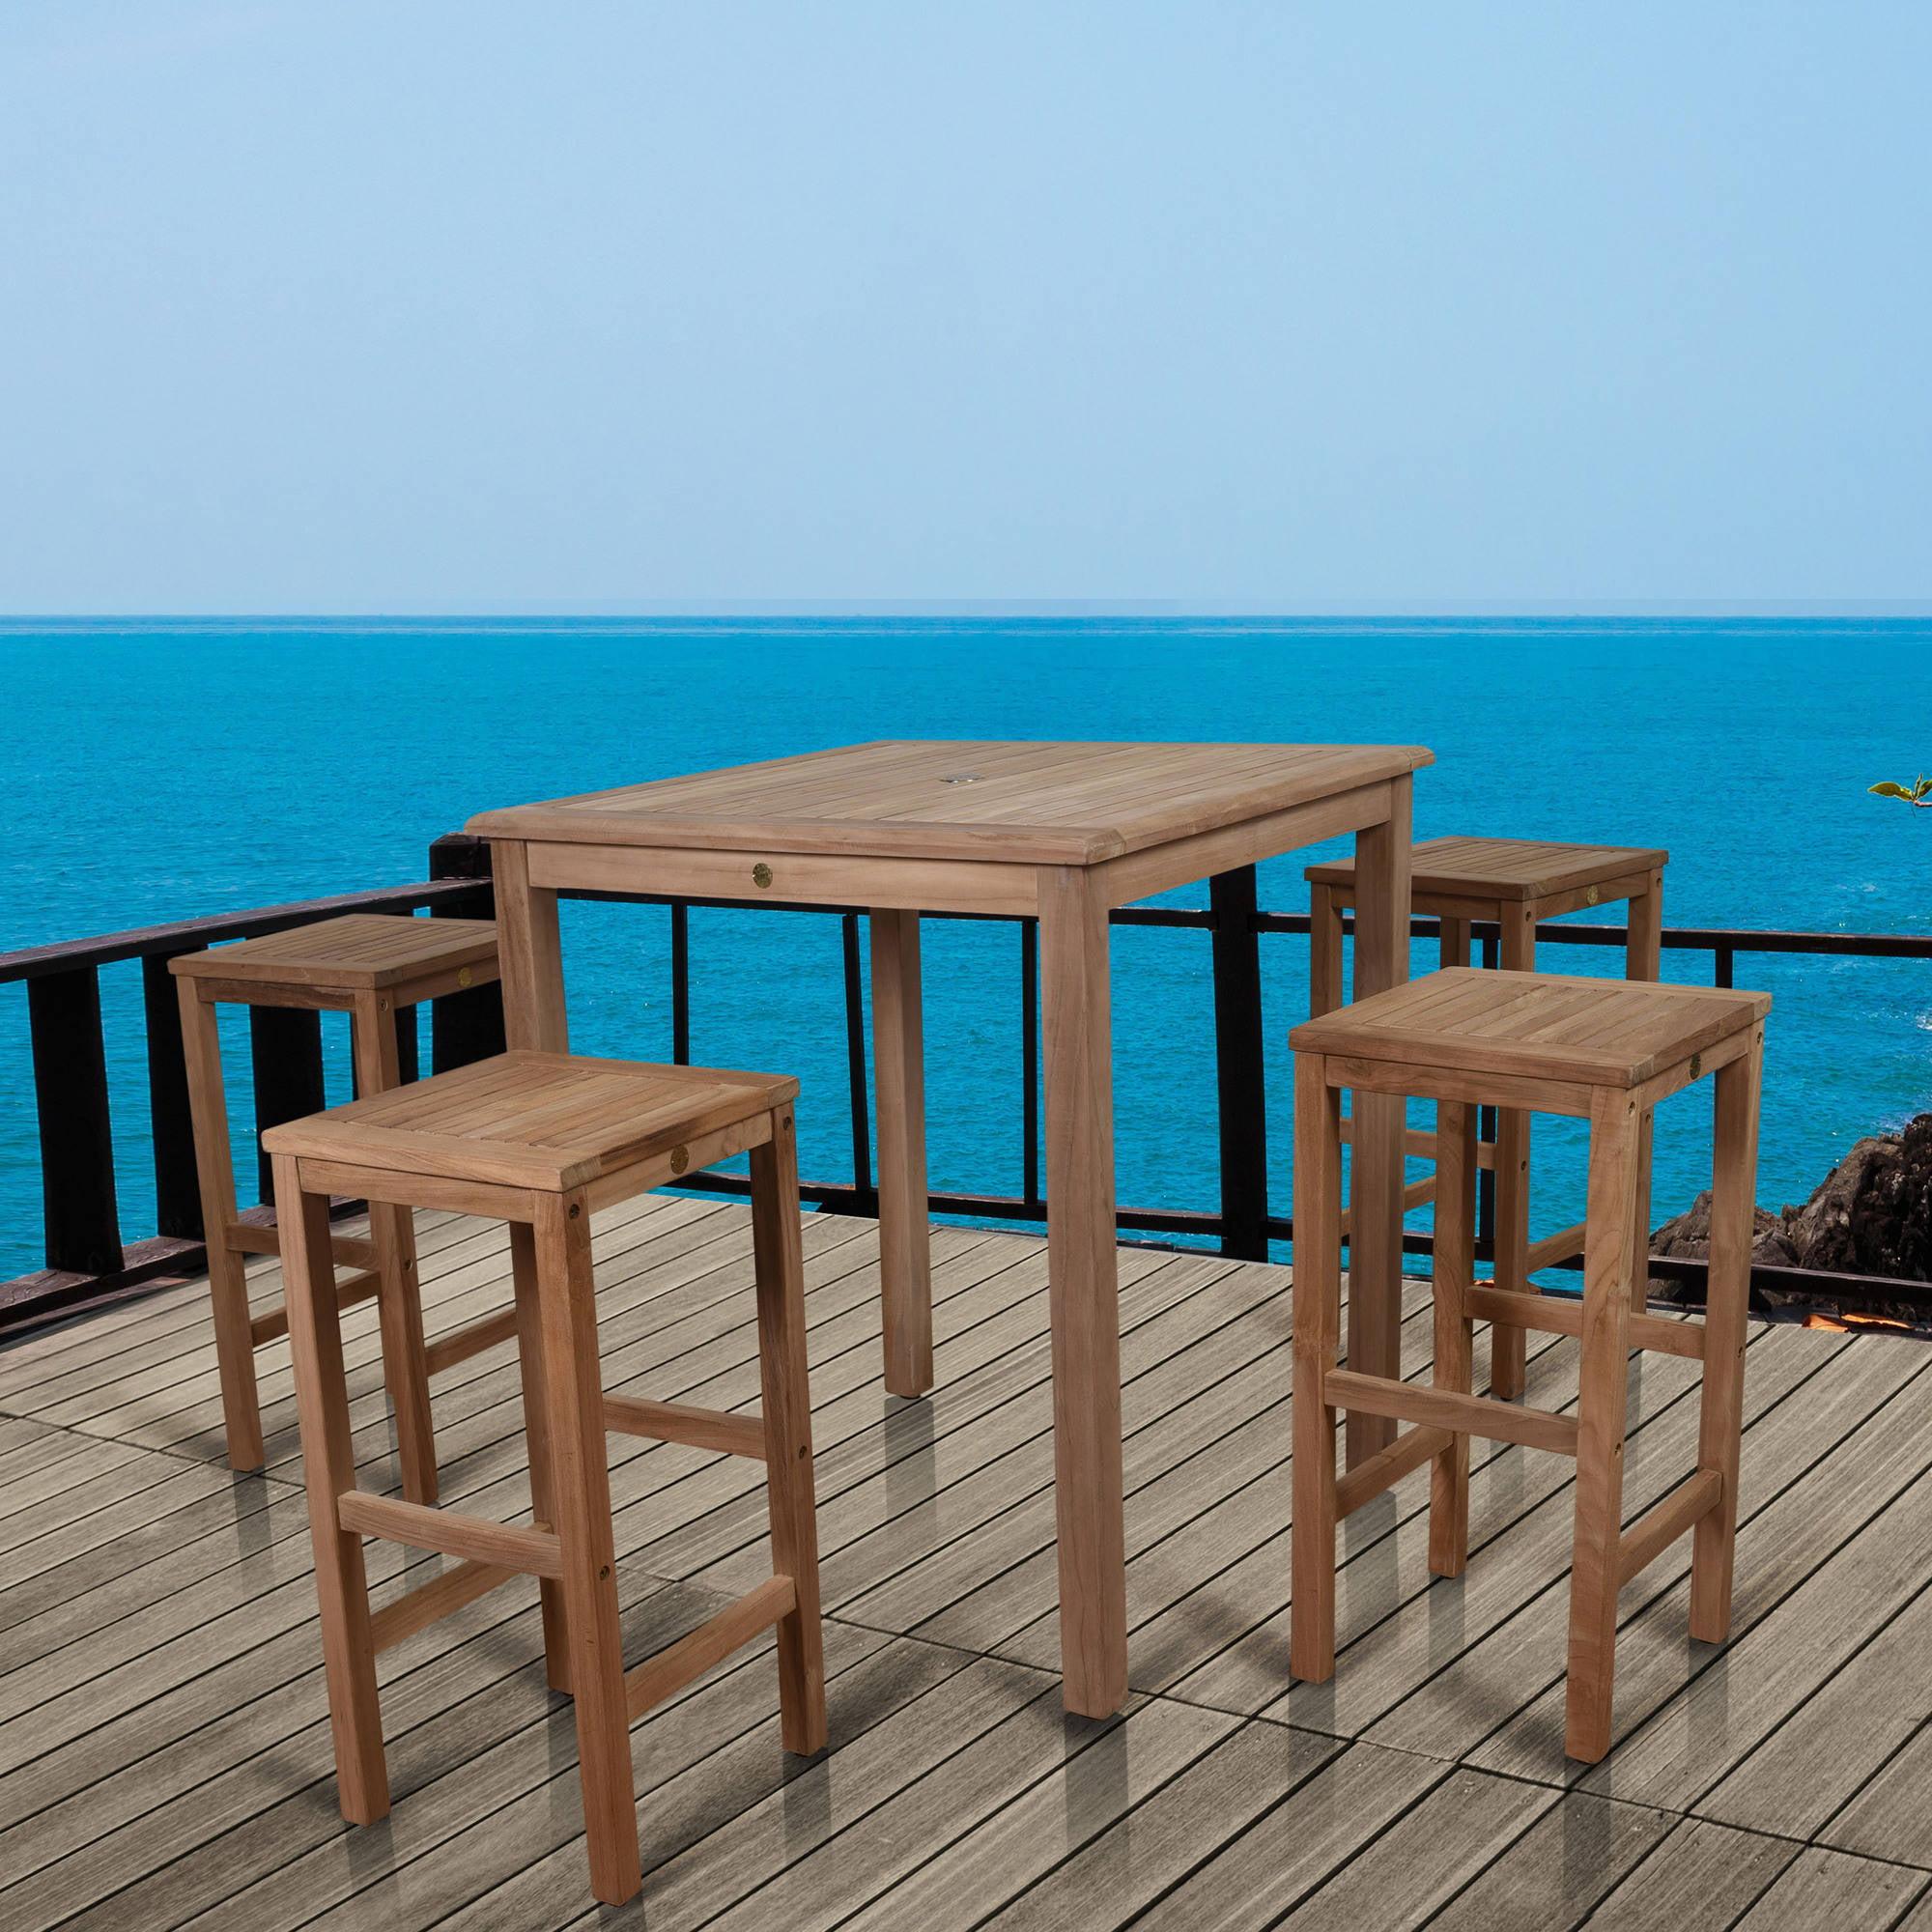 Amazonia Ares Bar Table set with 4 Texas Teak Wood Barstools